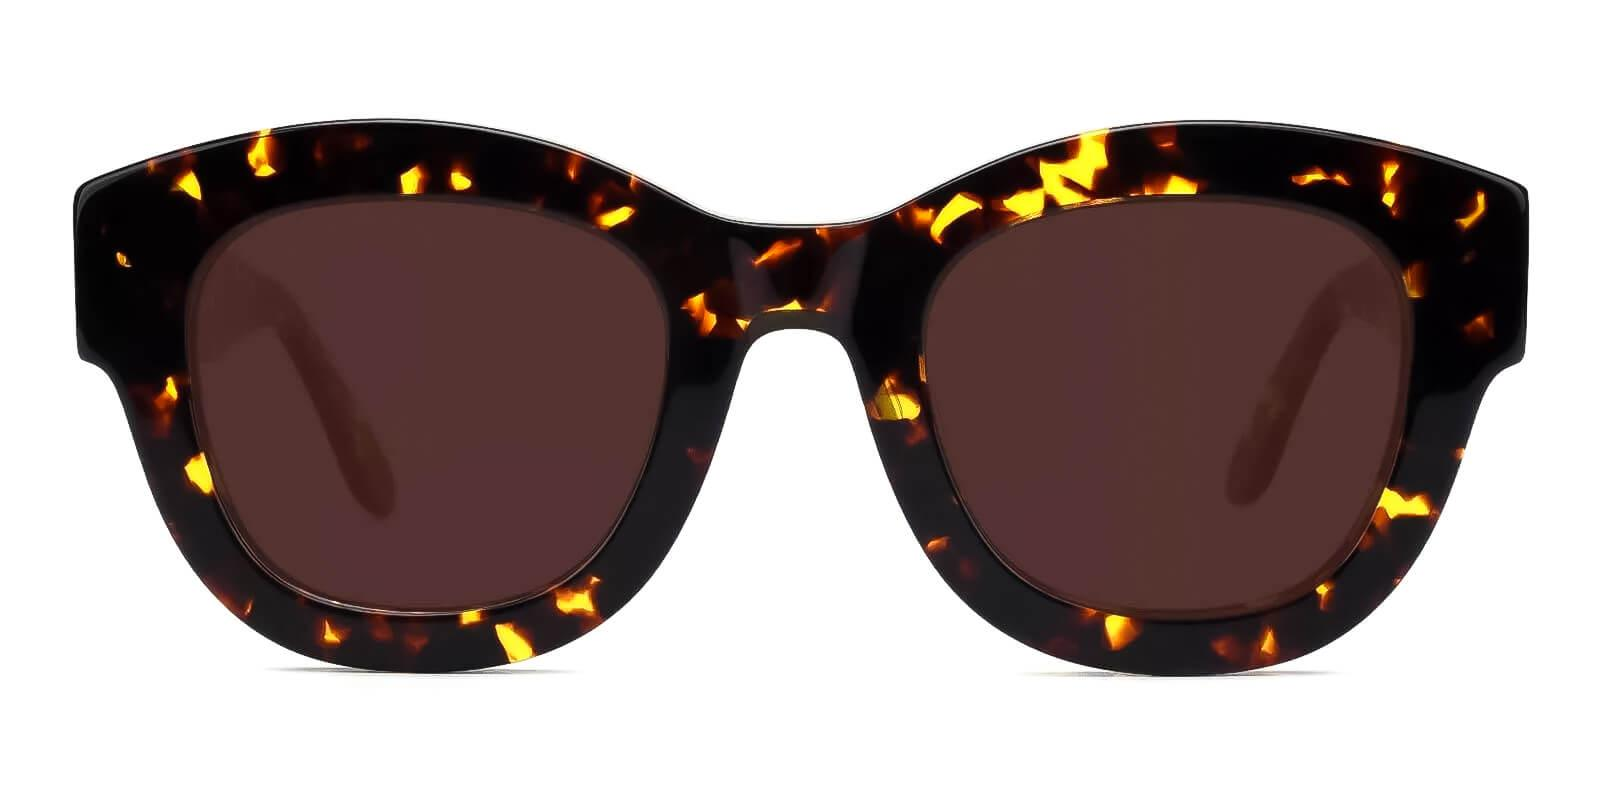 Meridian Tortoise Acetate Fashion , Sunglasses , UniversalBridgeFit Frames from ABBE Glasses